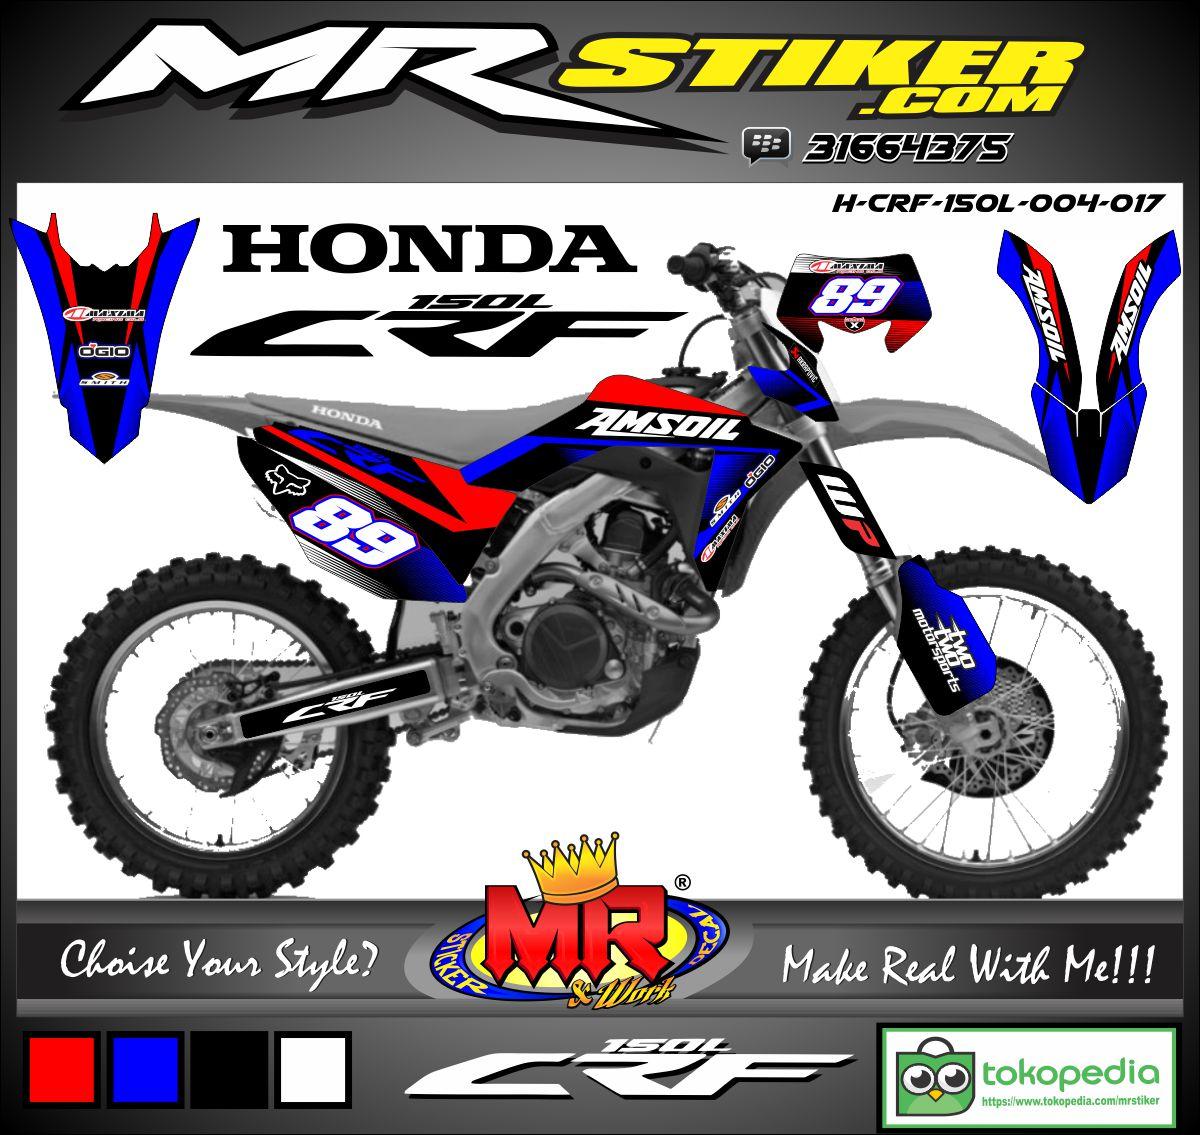 Katalog Stiker Motor Striping Suka Decal Mr All New Cbr 150r Racing Red Klaten Crf 150 L Simple Track